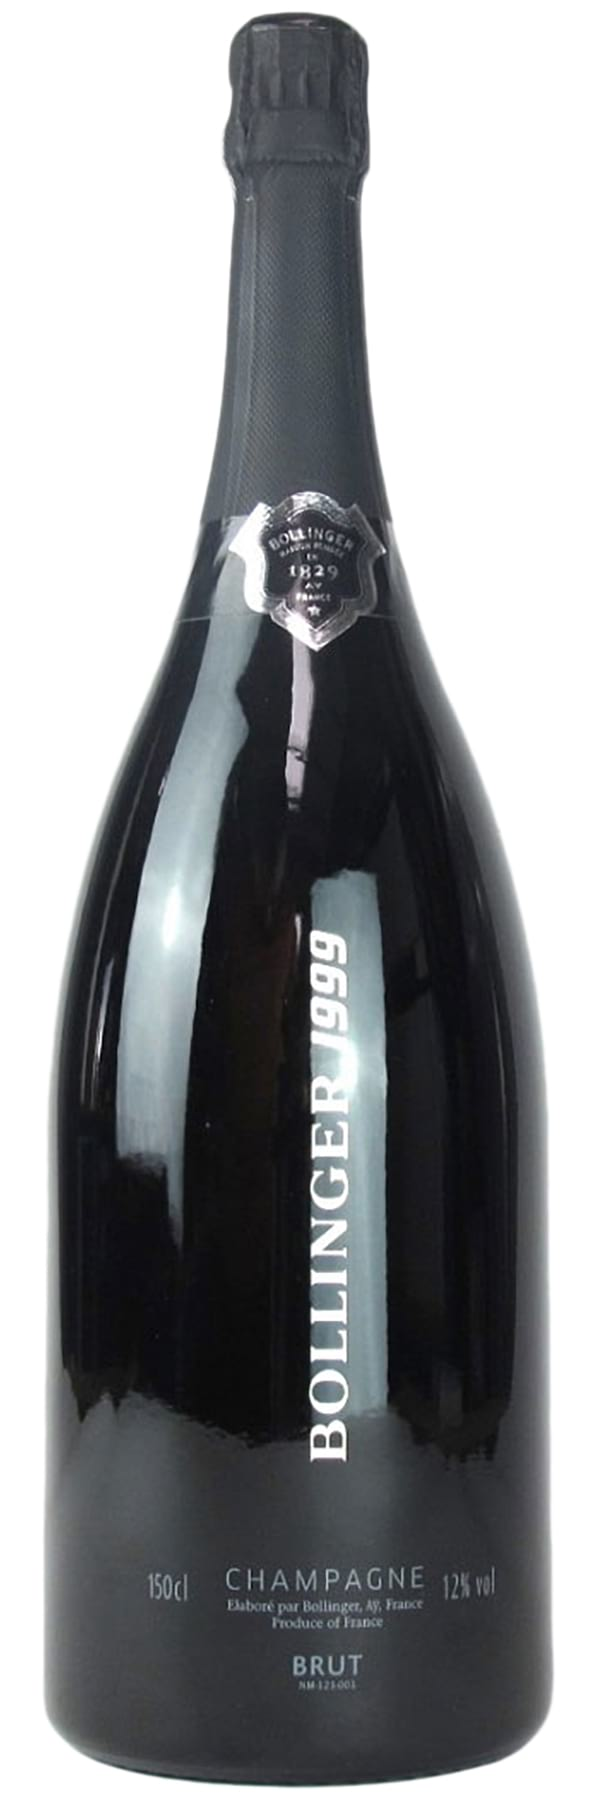 1999 Bollinger James Bond 007 Limited Edition Quantum Of Solace (Magnum) 1.5 liter фото